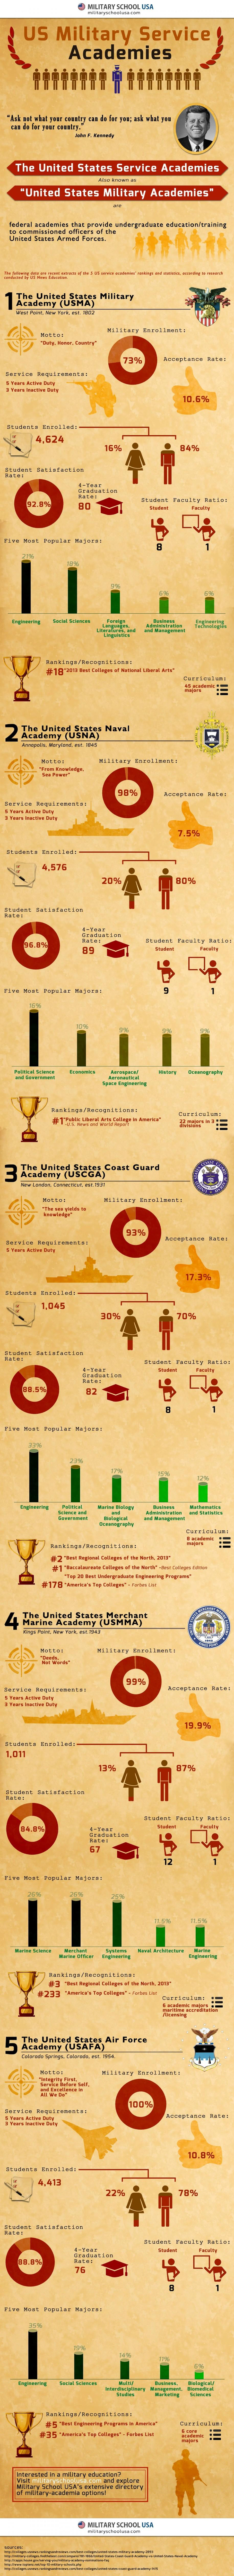 6. US military service academies